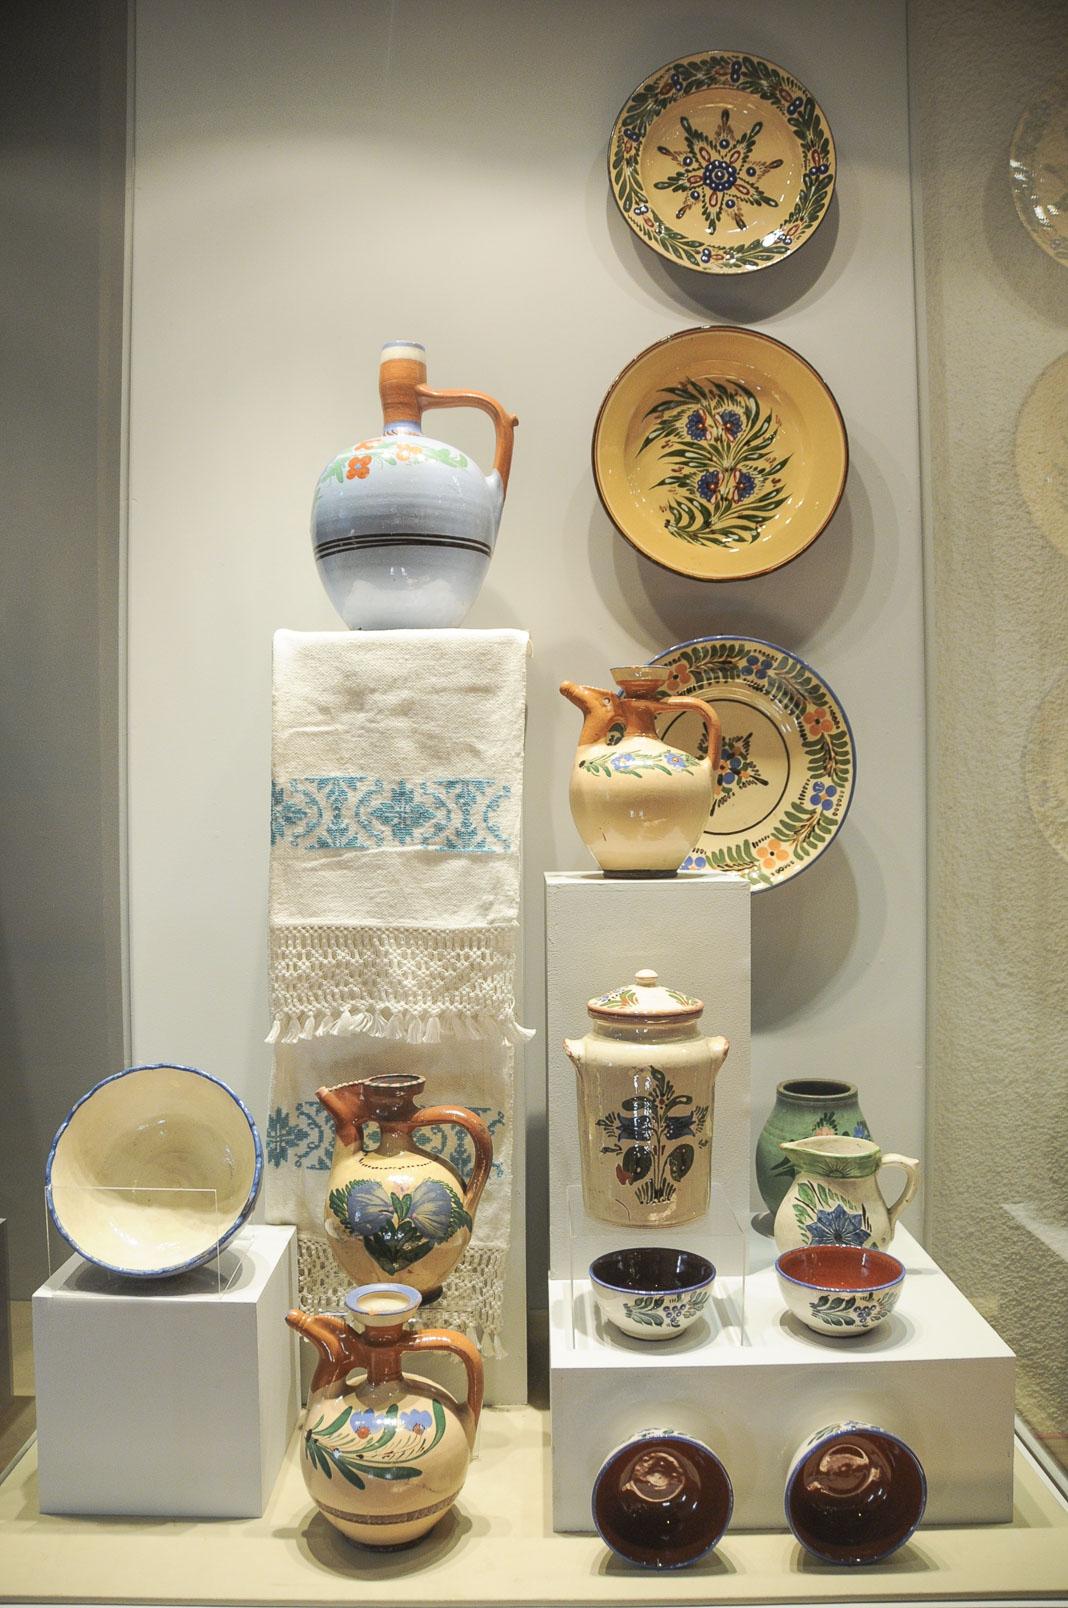 troyan-museum-cvetqta-na-zografa-17